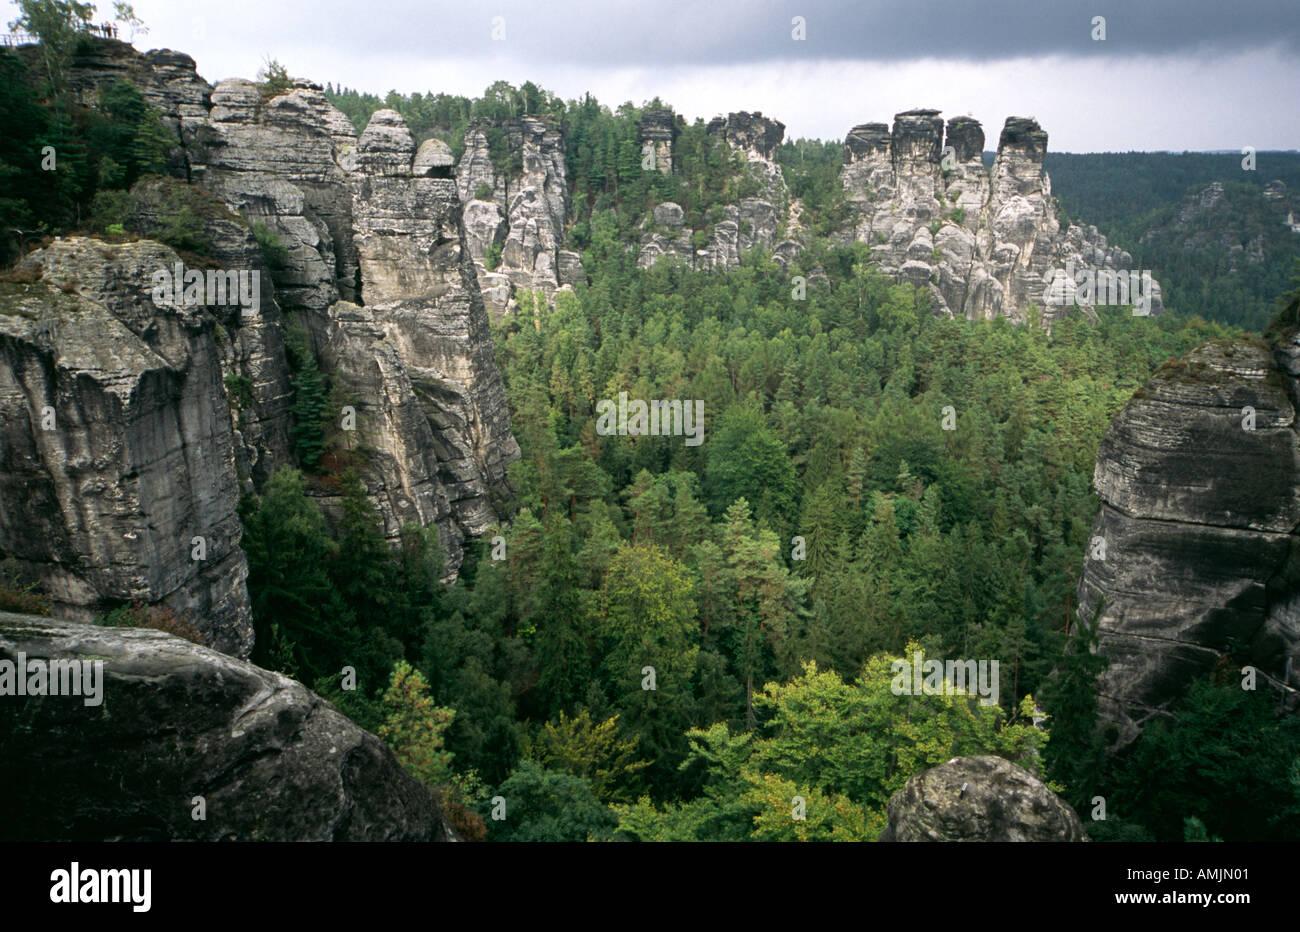 ELBE SANDSTONE MOUNTAINS SAXON SWITZERLAND GERMANY Stock Photo